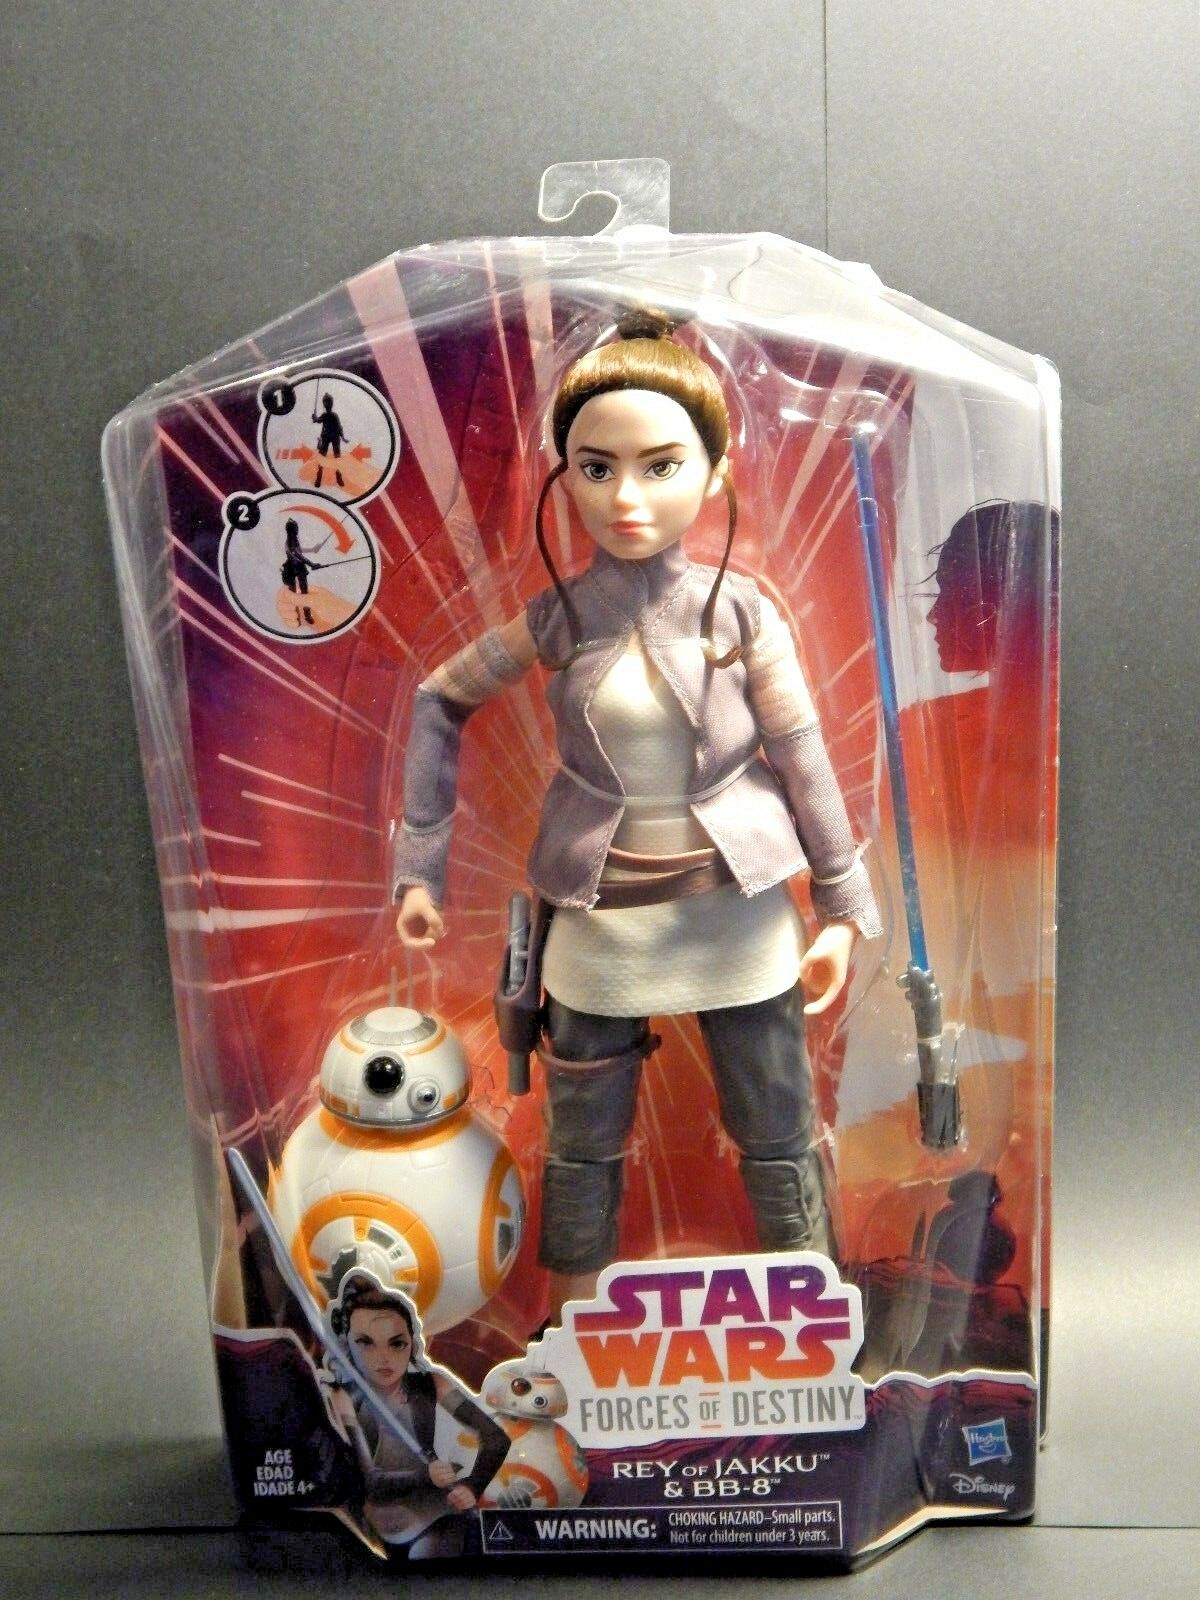 Star Wars Forces of Destiny Rey & BB8 sealed